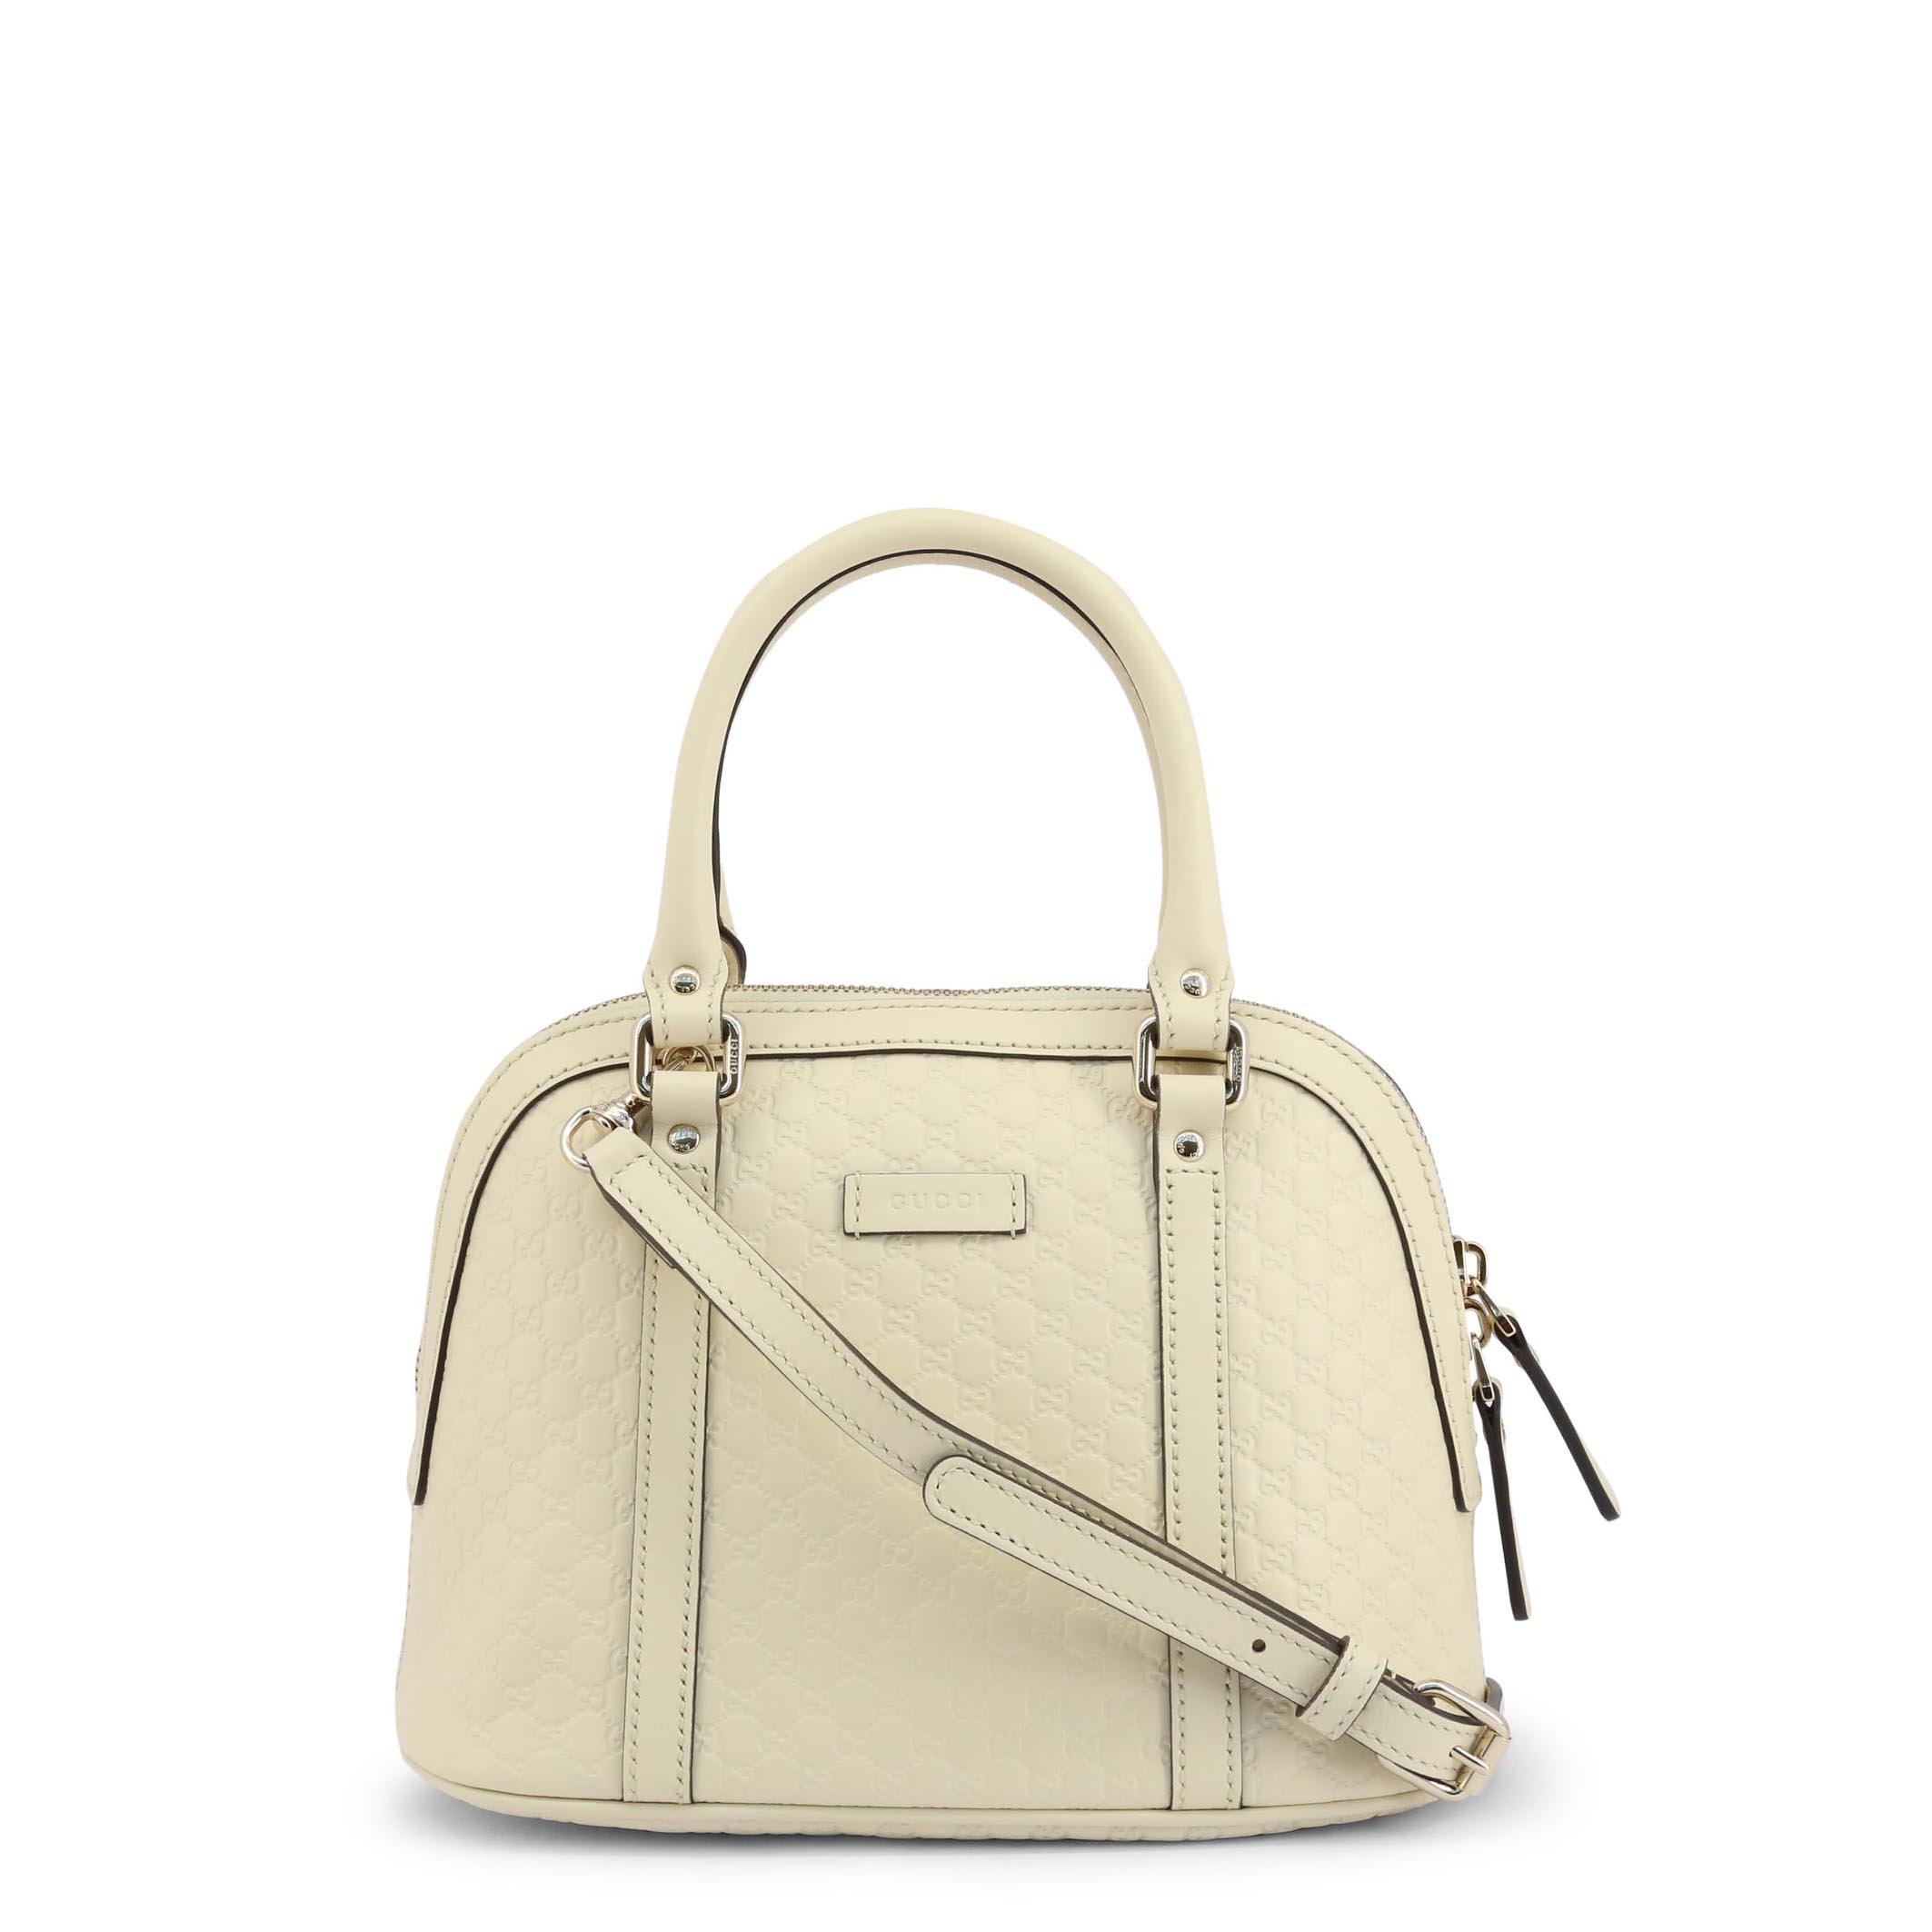 Gucci Women's Handbag Black 449654 - white NOSIZE